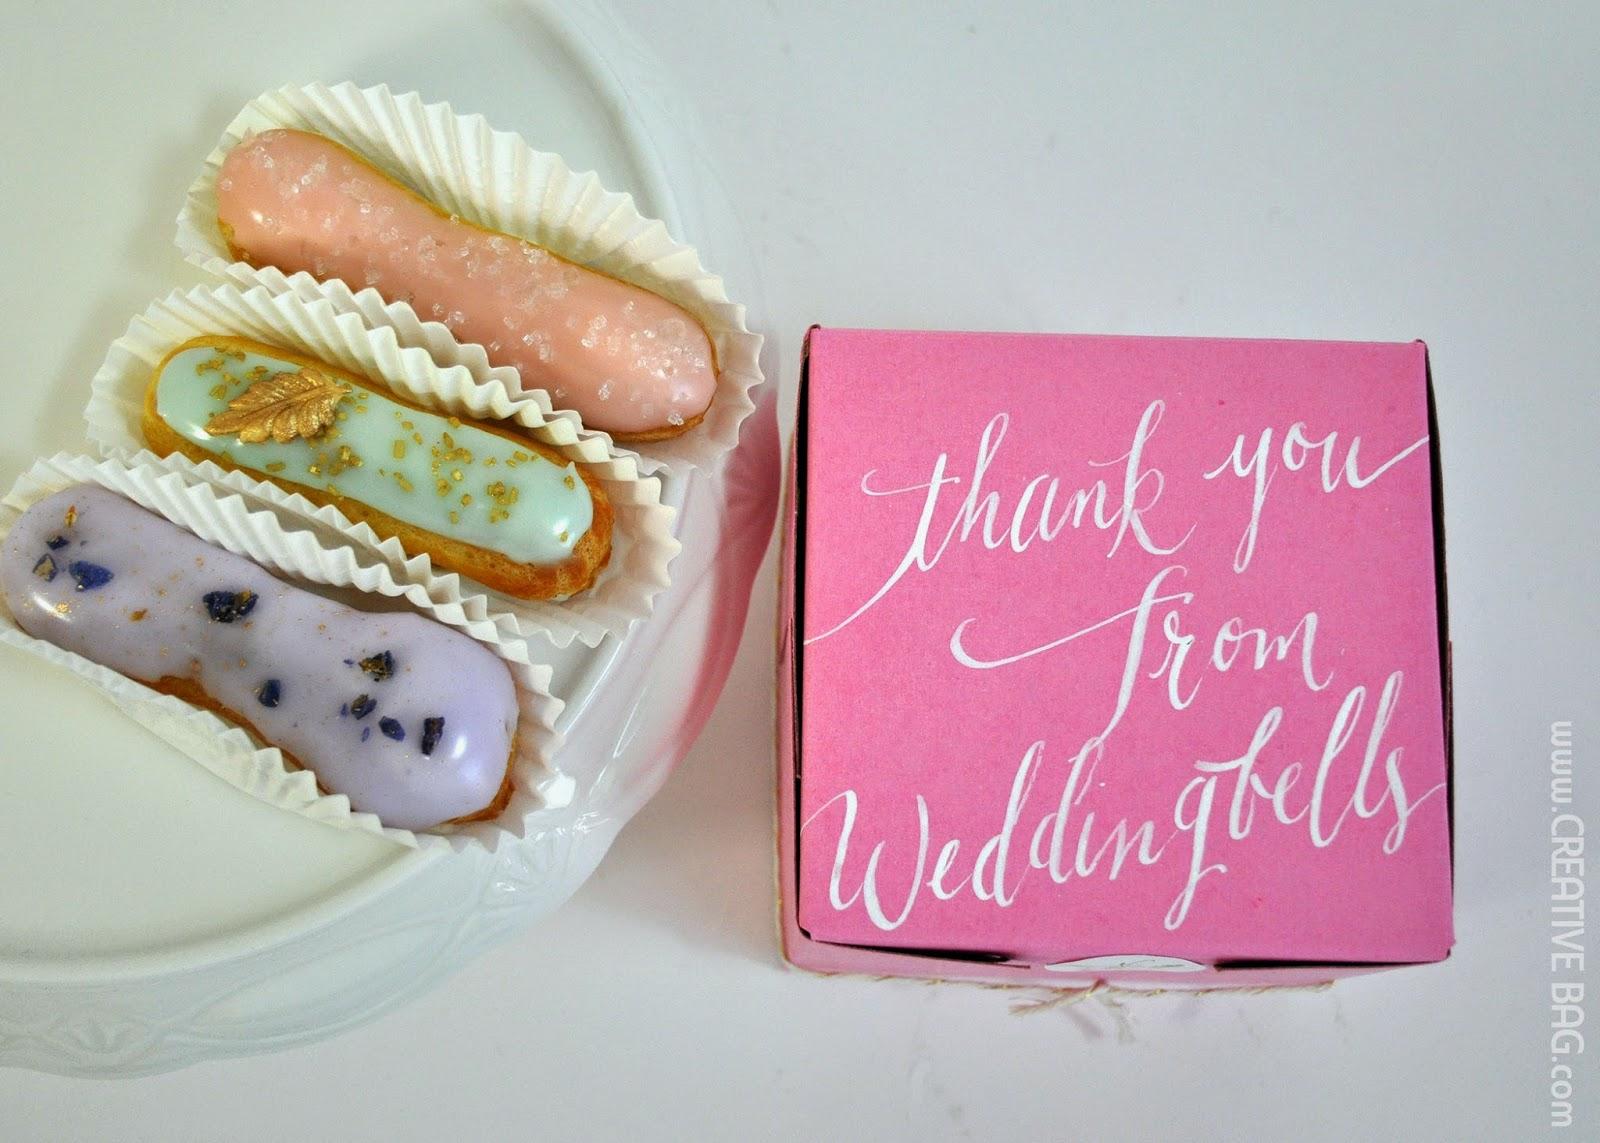 the creative bag blog: Cupcake Bakery Box + Mini Eclairs + ...